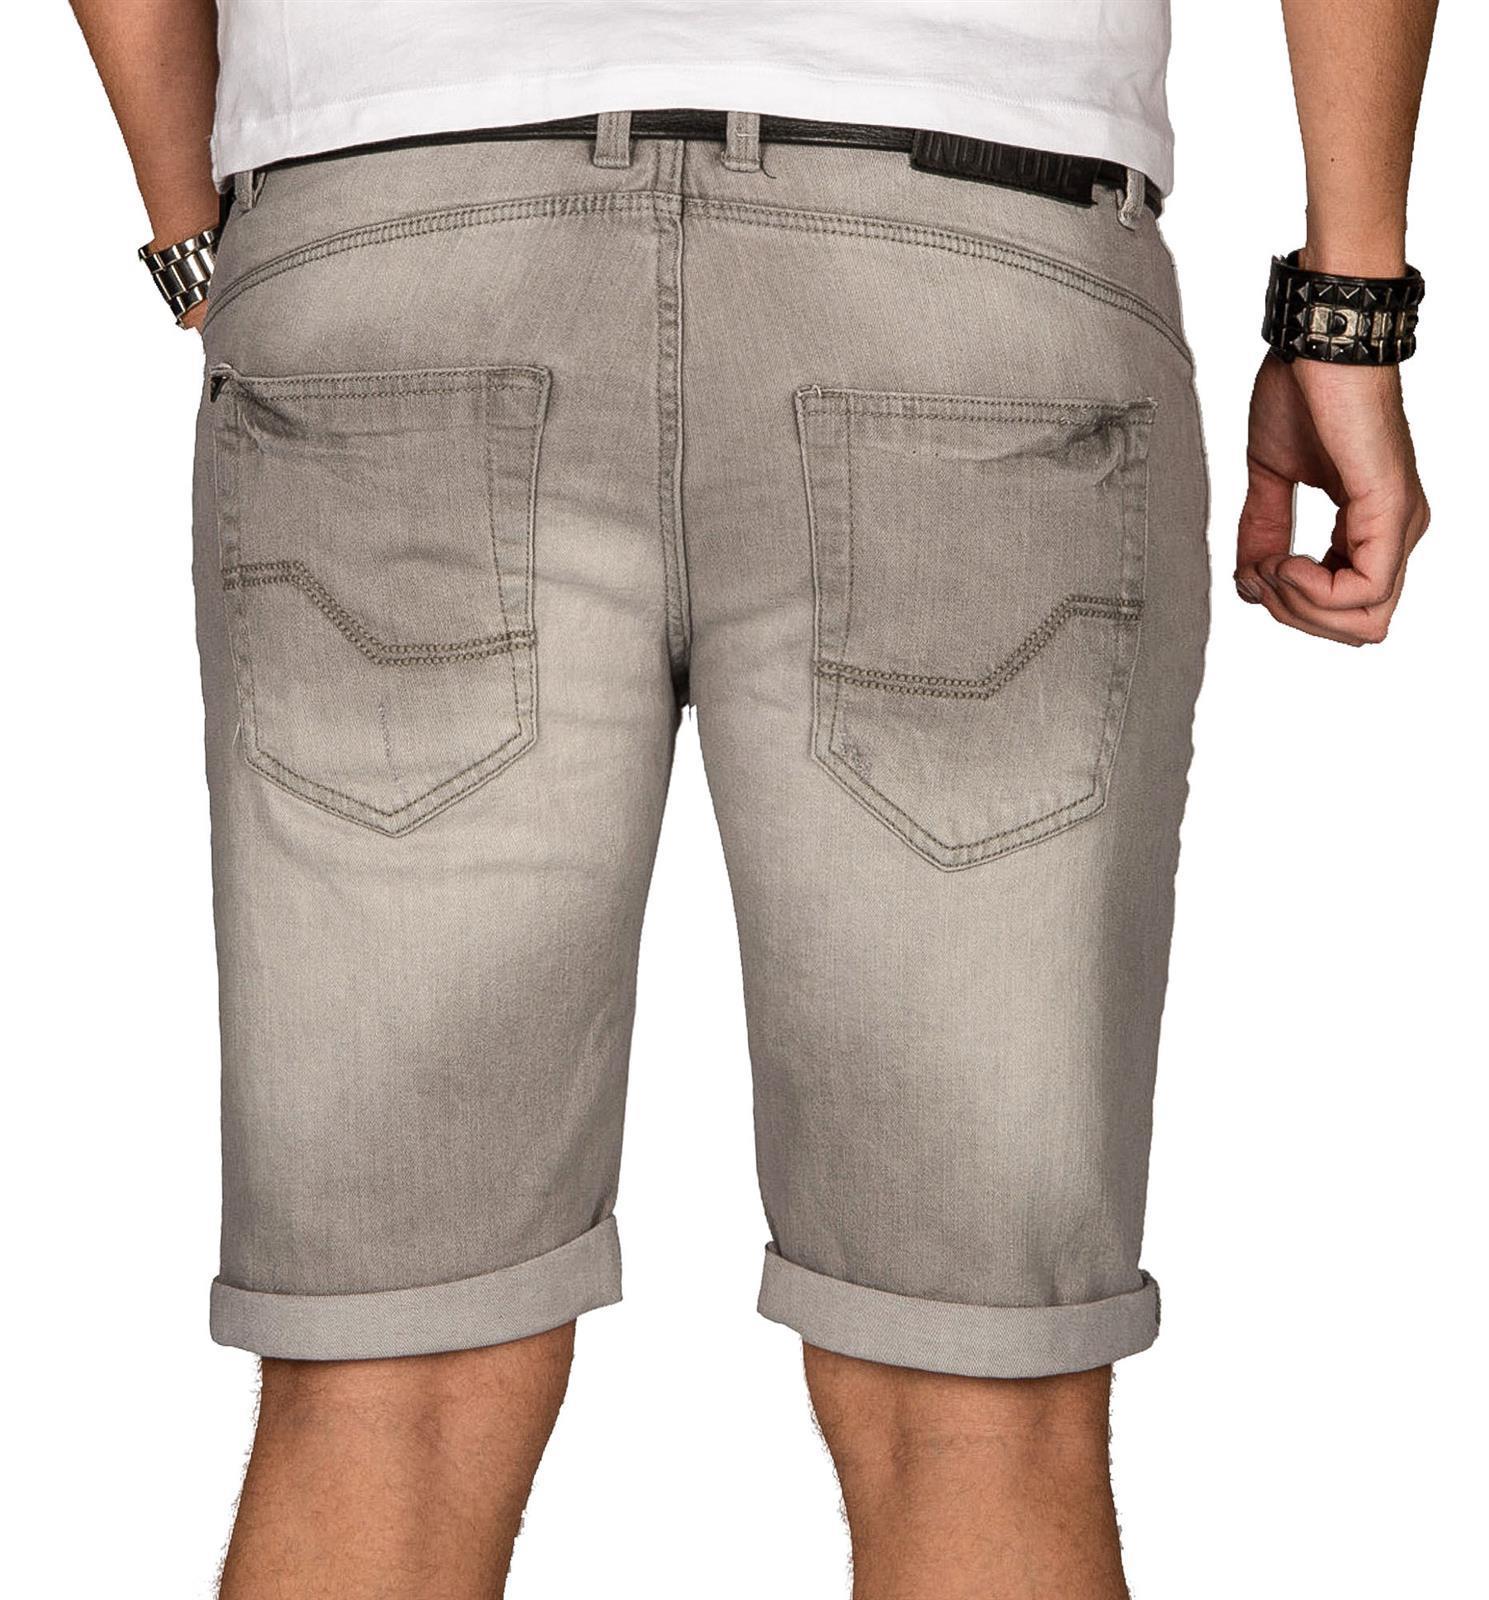 Indicode-Herren-Sommer-Bermuda-Jeans-Shorts-kurze-Hose-Sommerhose-Short-Neu-B556 Indexbild 21